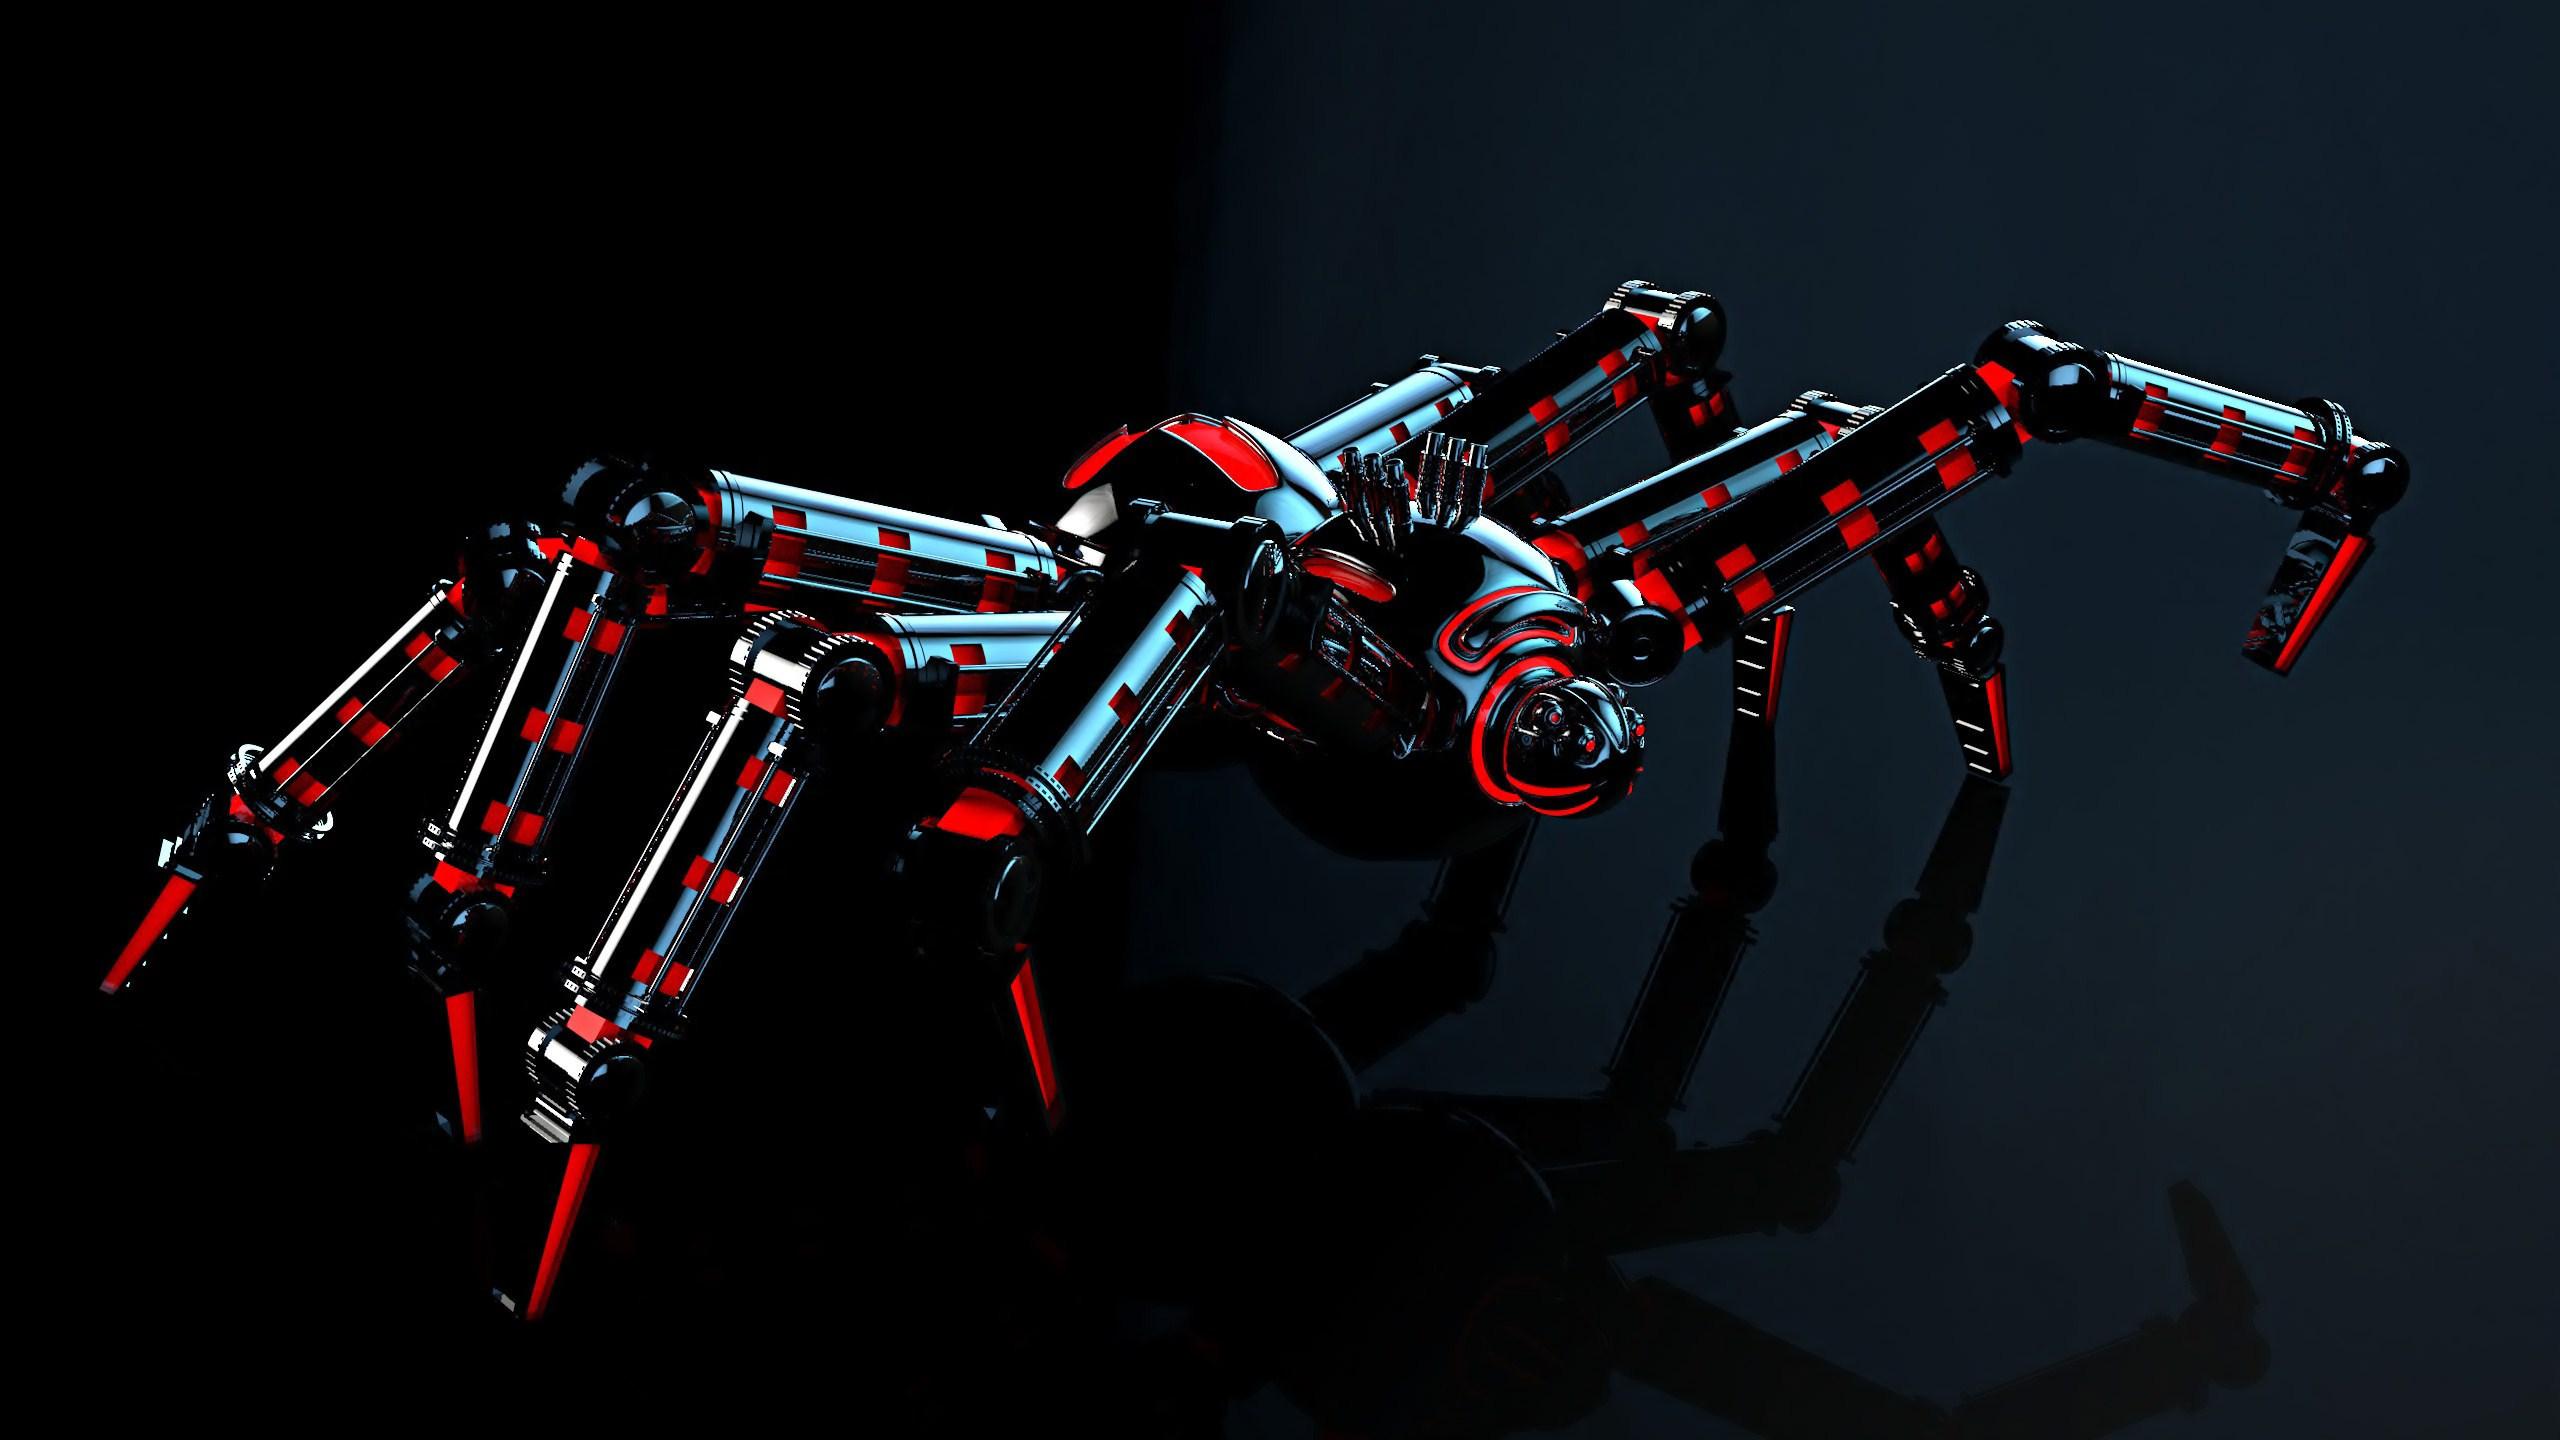 Black Widow Spider Hd wallpapers HD   477321 2560x1440